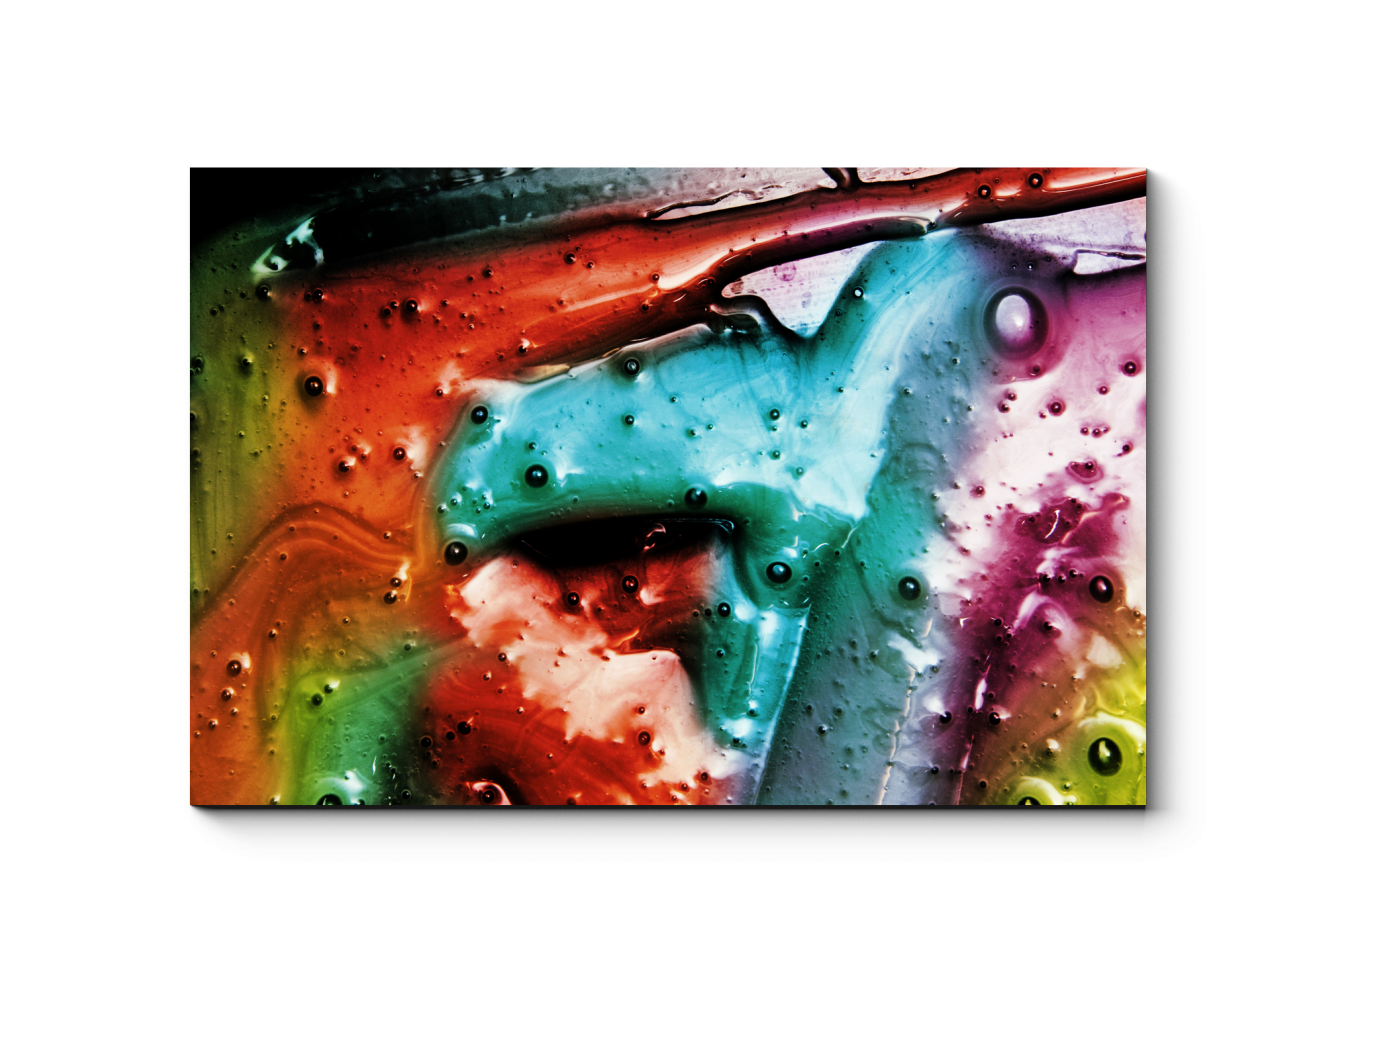 Модульная картина Экспрессия (30x20) фото